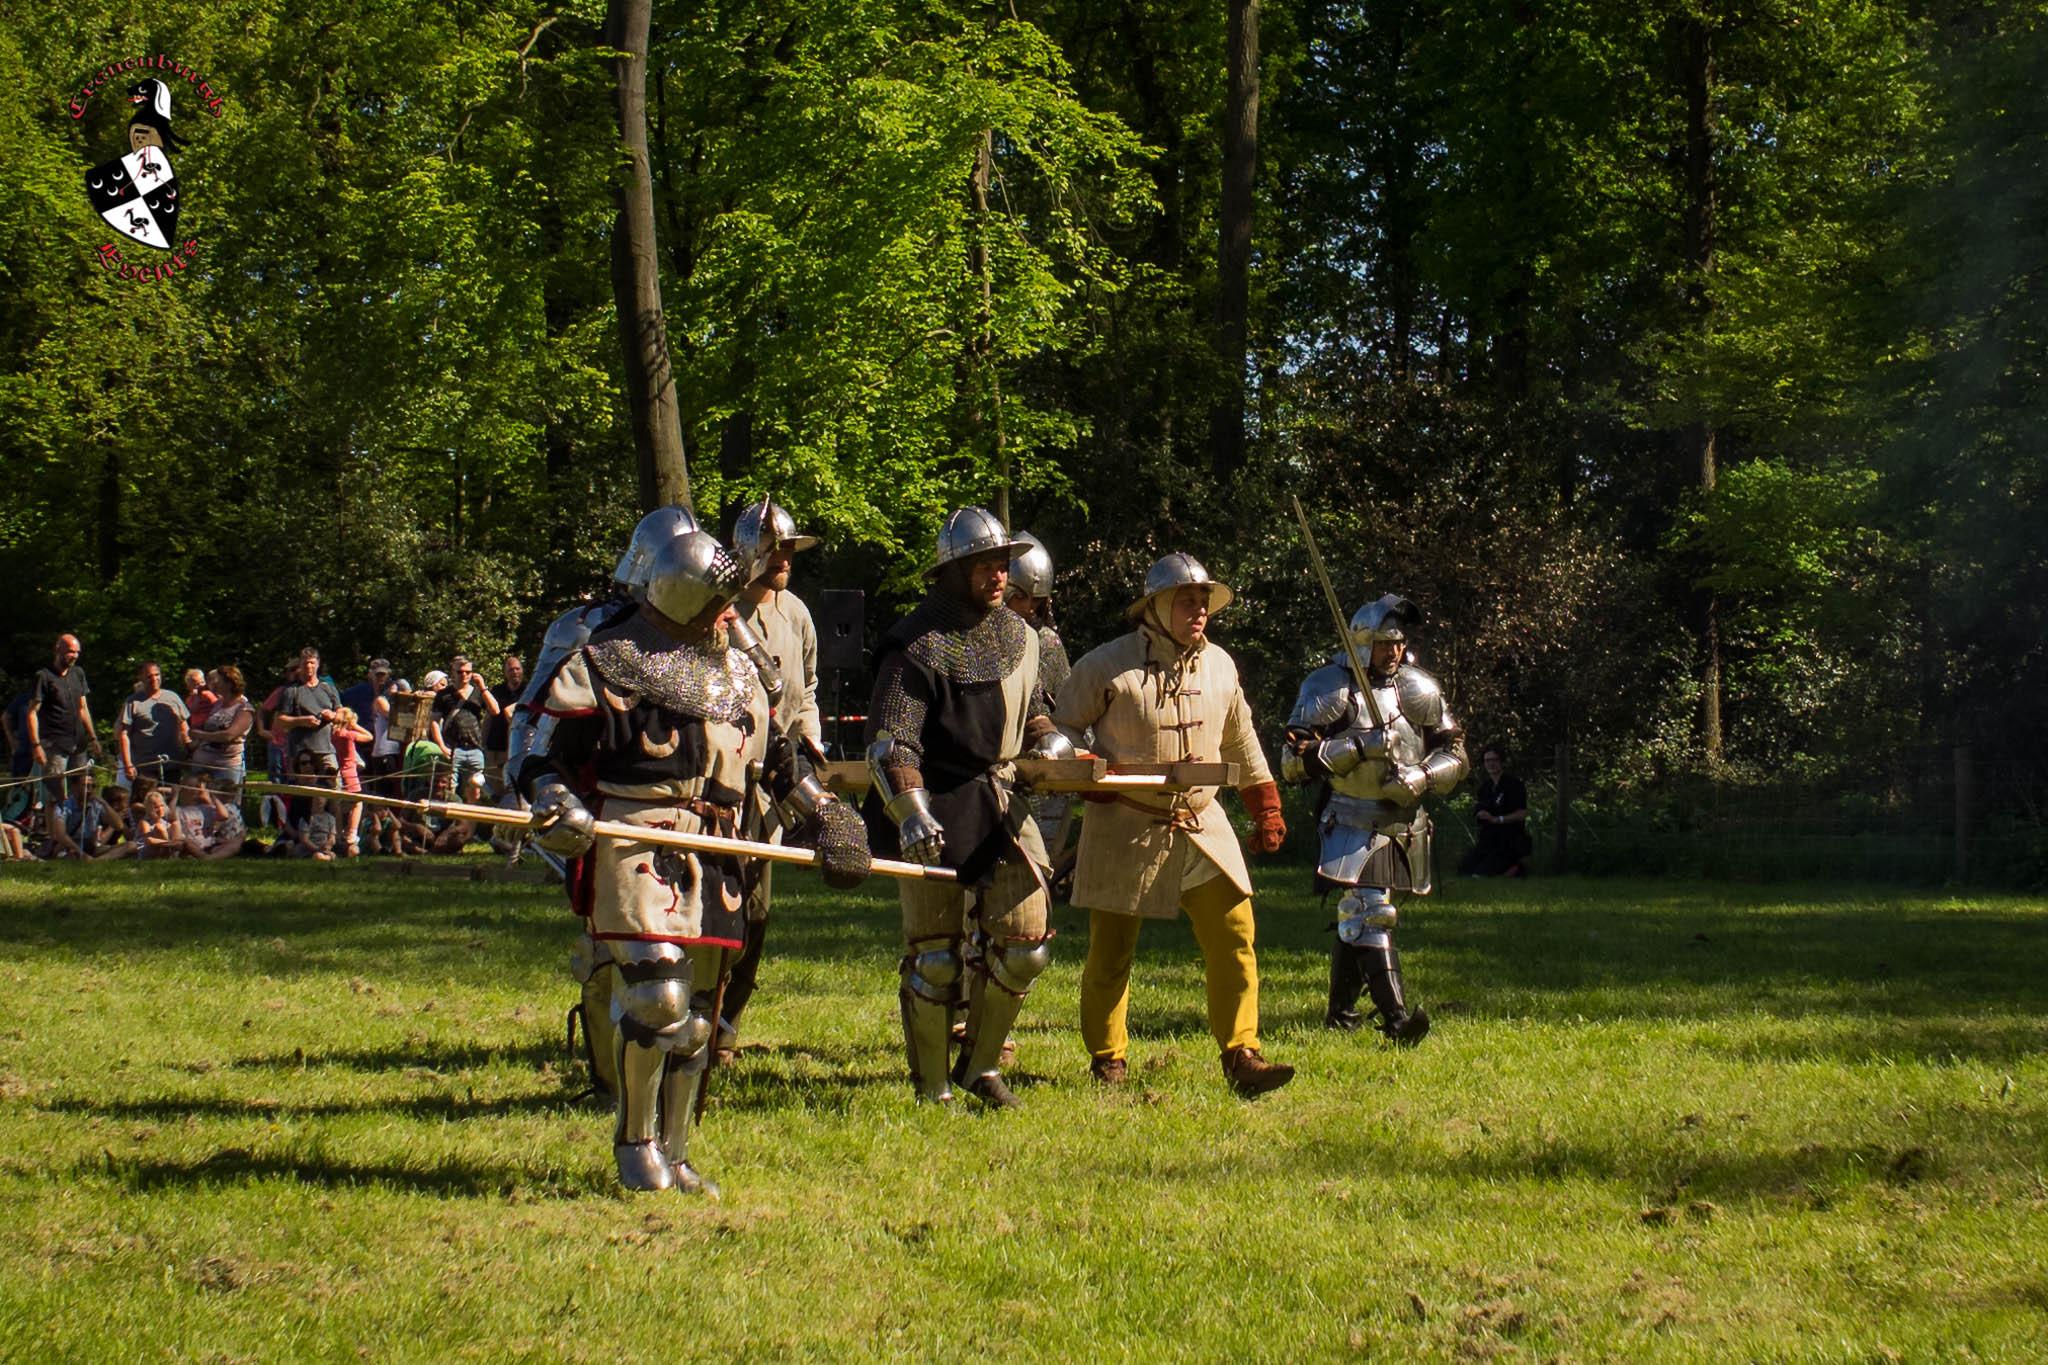 Middeleeuws-Festijn-Cannenburgh-2018-Algemeen-Ellen-la-Faille-42